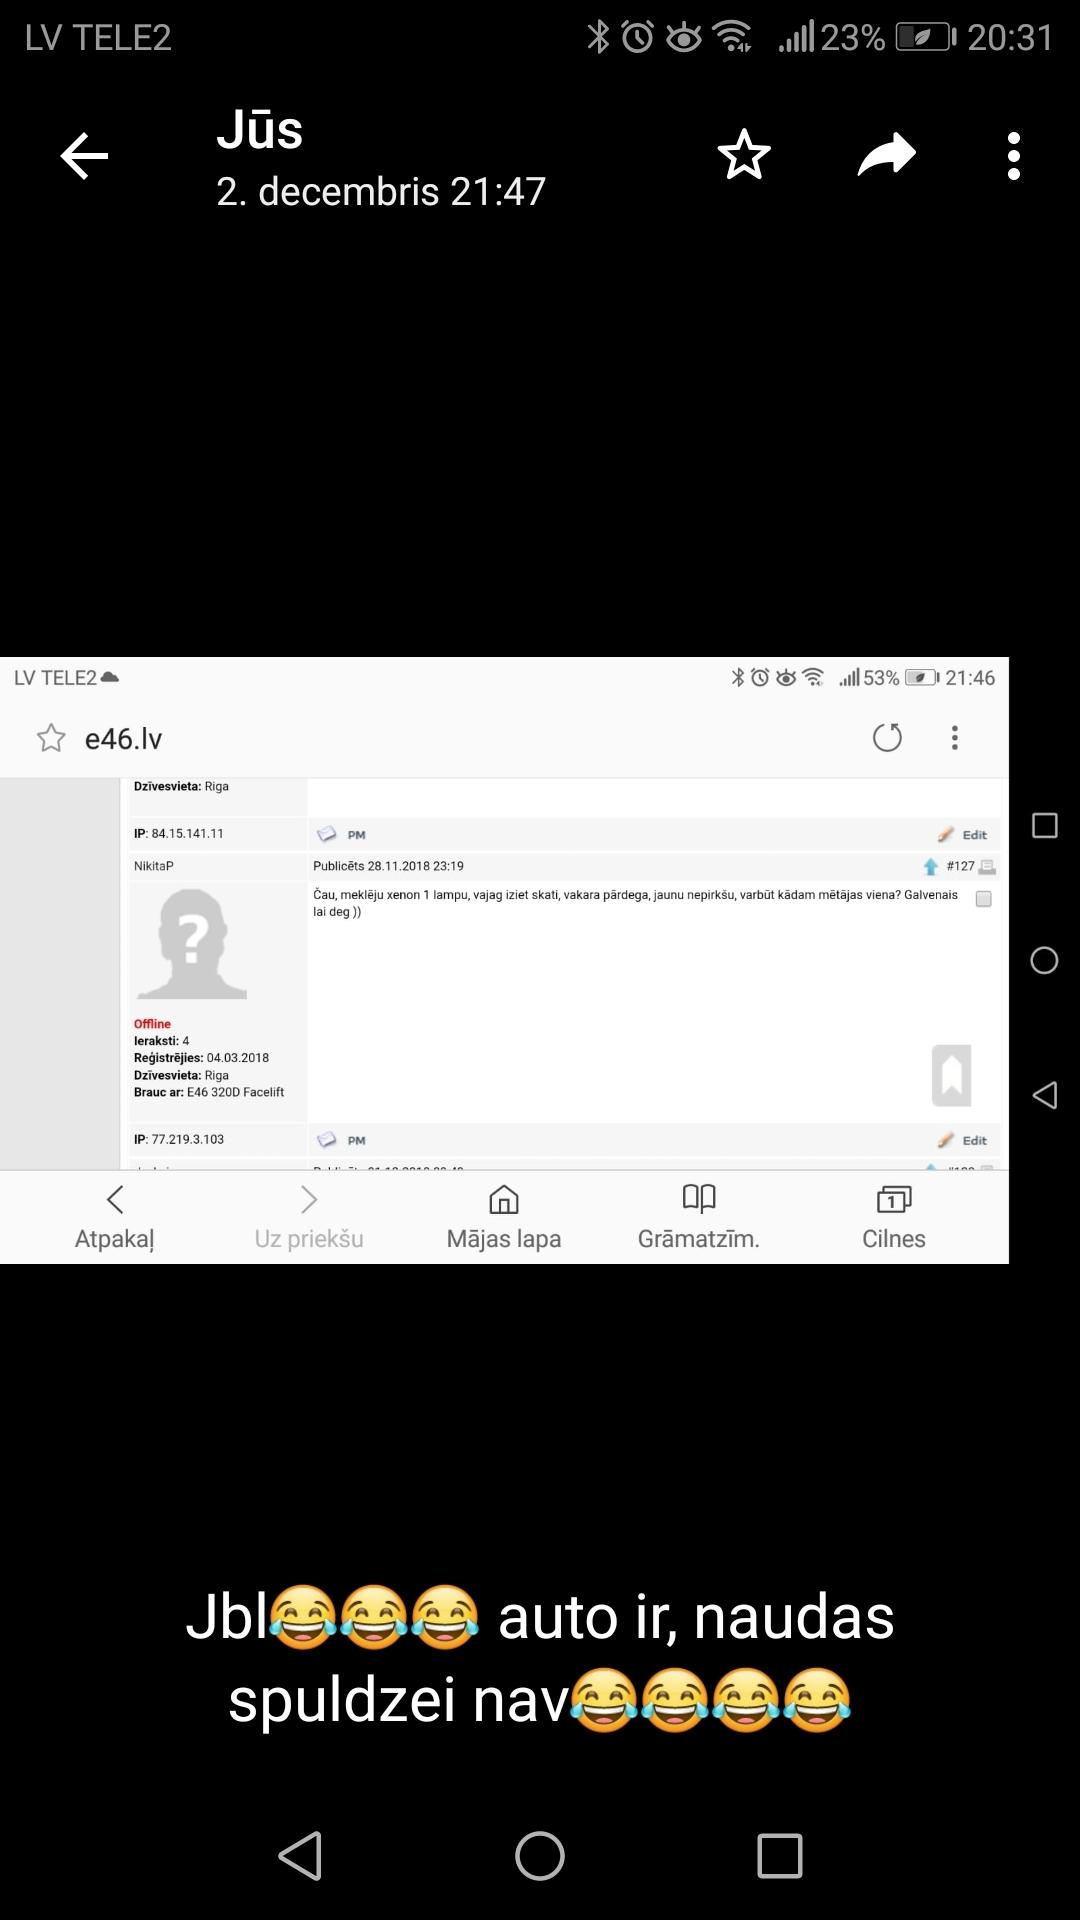 inbox.lv/albums/m/modjoe46/Snapshot/Screenshot-20181205-203151.sized.jpg